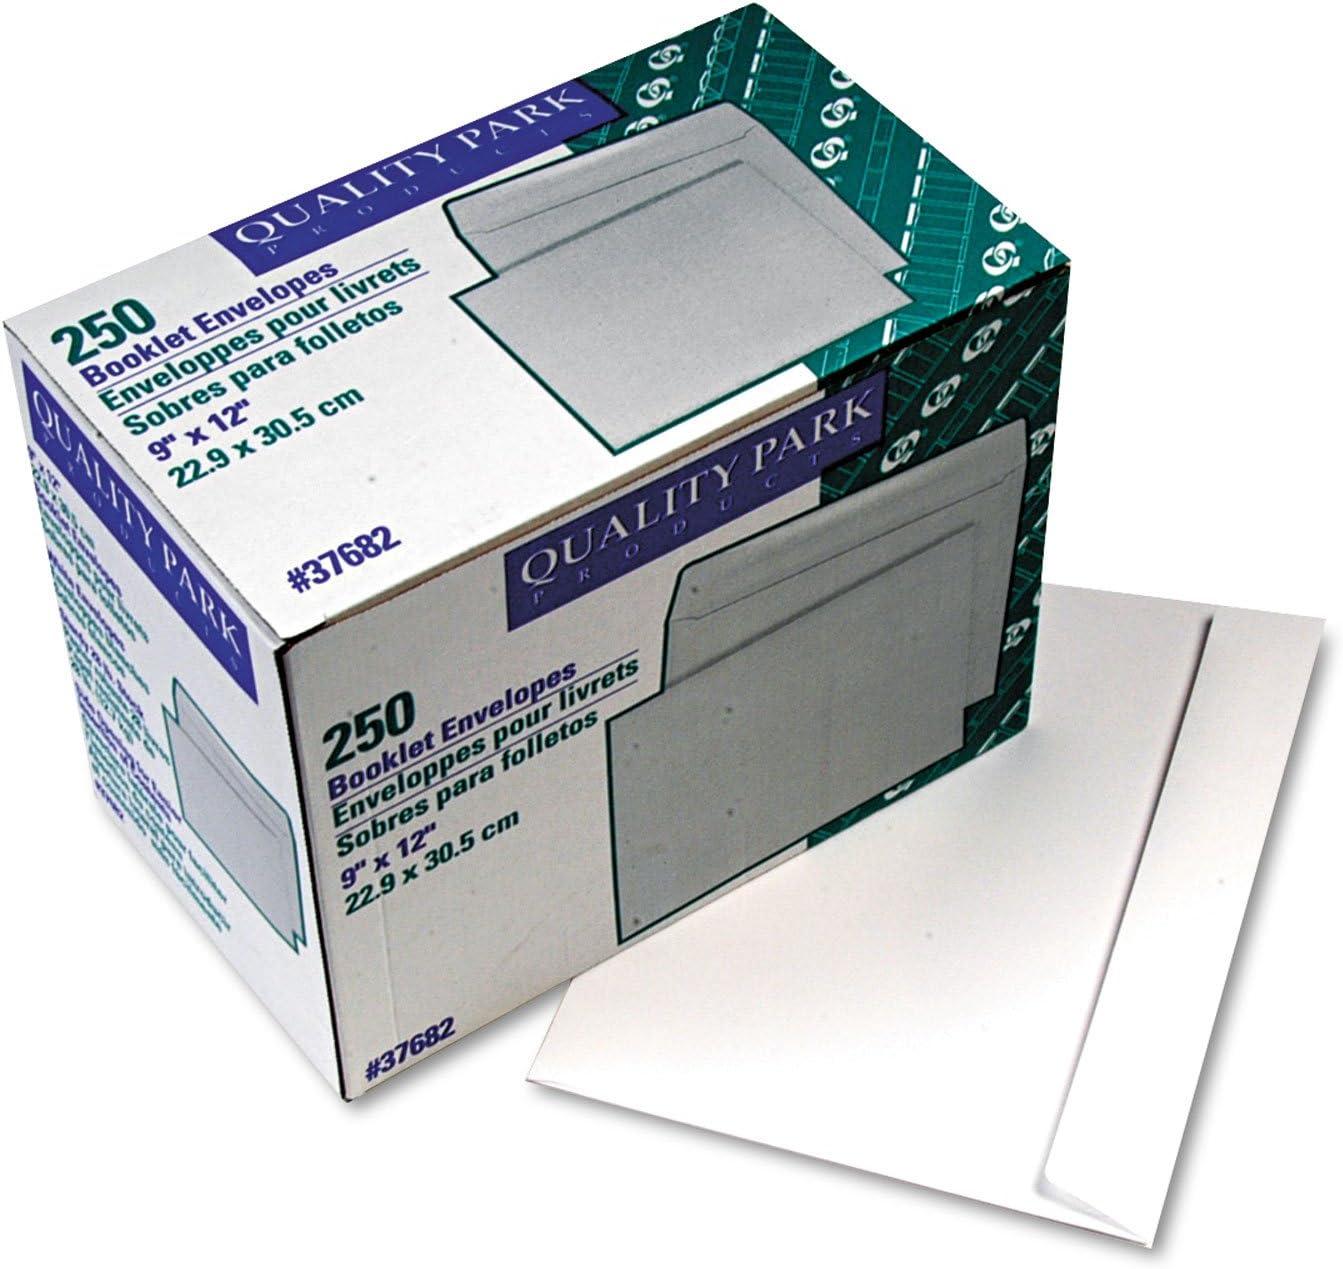 QUA37682 - Quality Park Booklet Open Max 78% OFF Envelope Side Large-scale sale